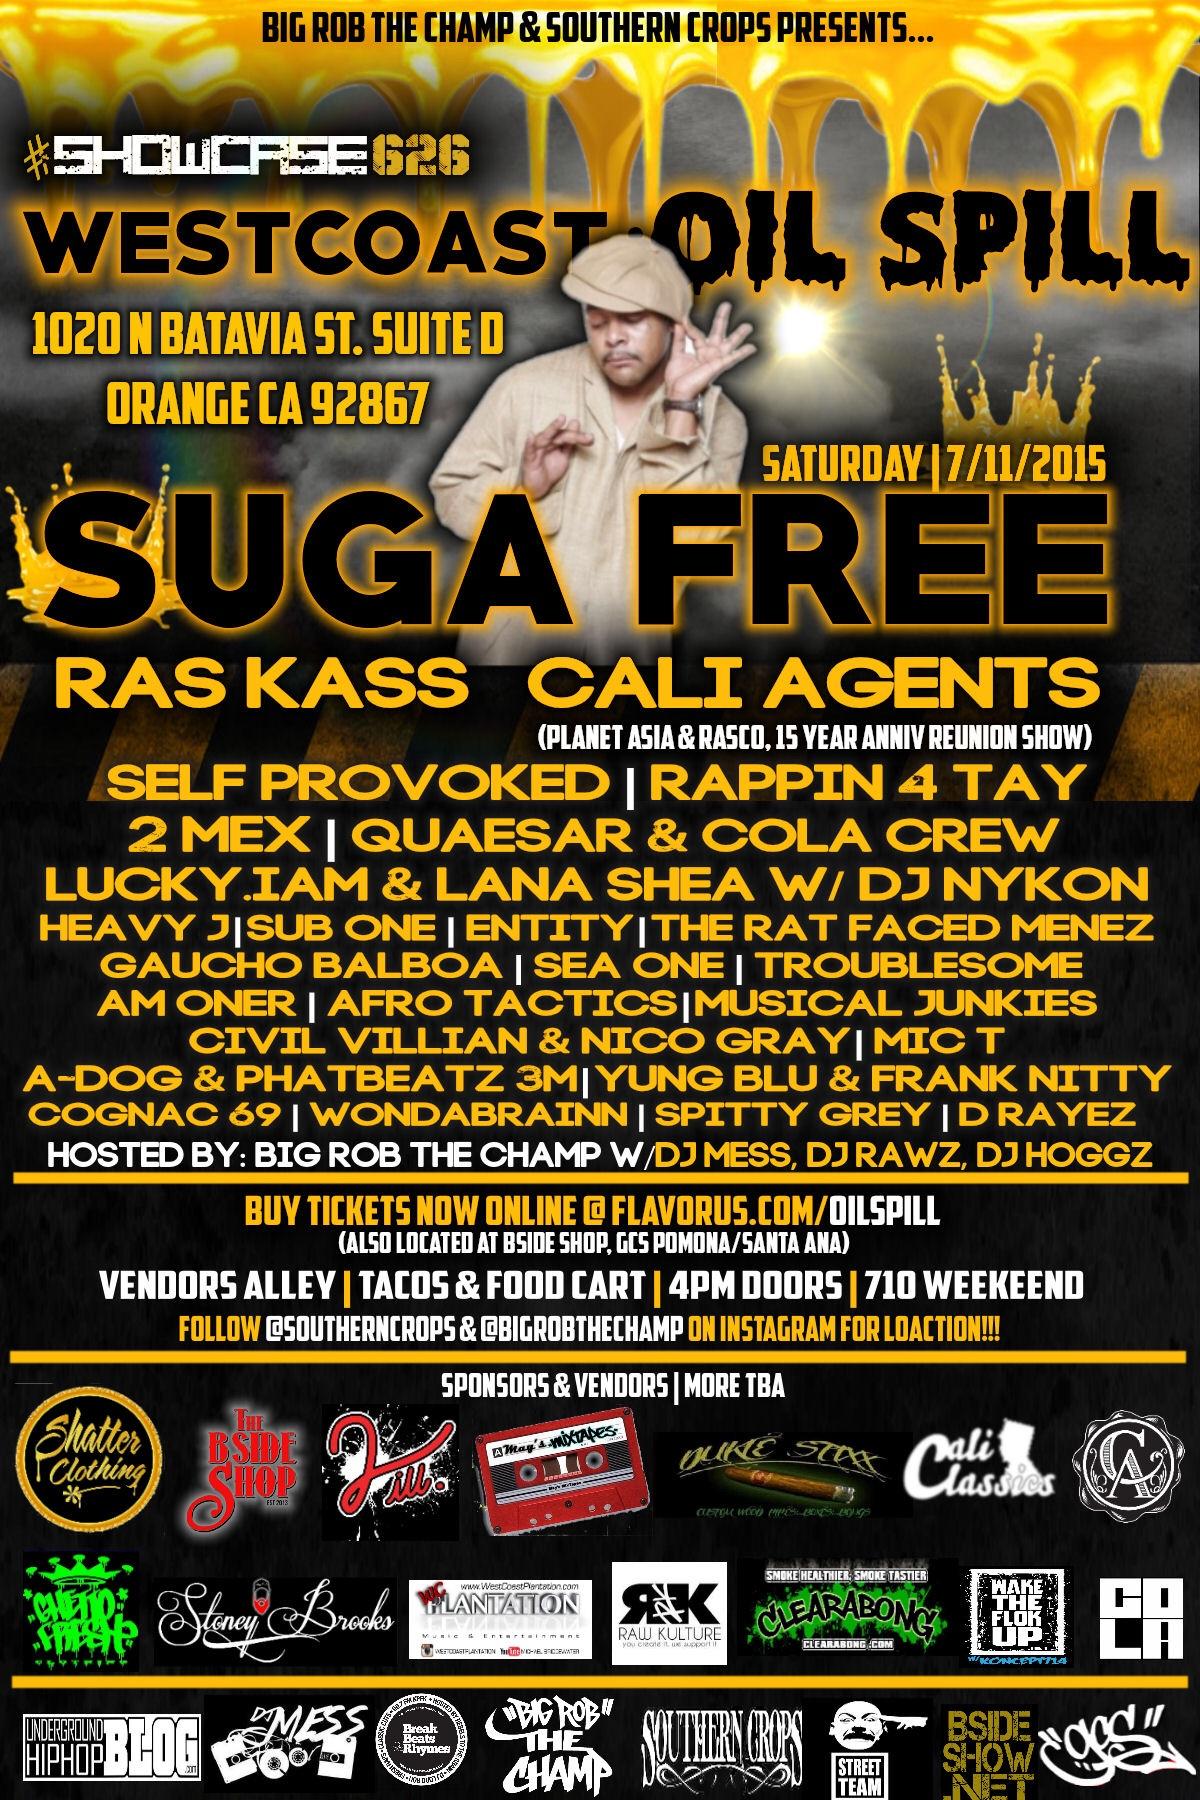 Westcoast: OIL SPILL w/Suga free Tickets 07/11/15